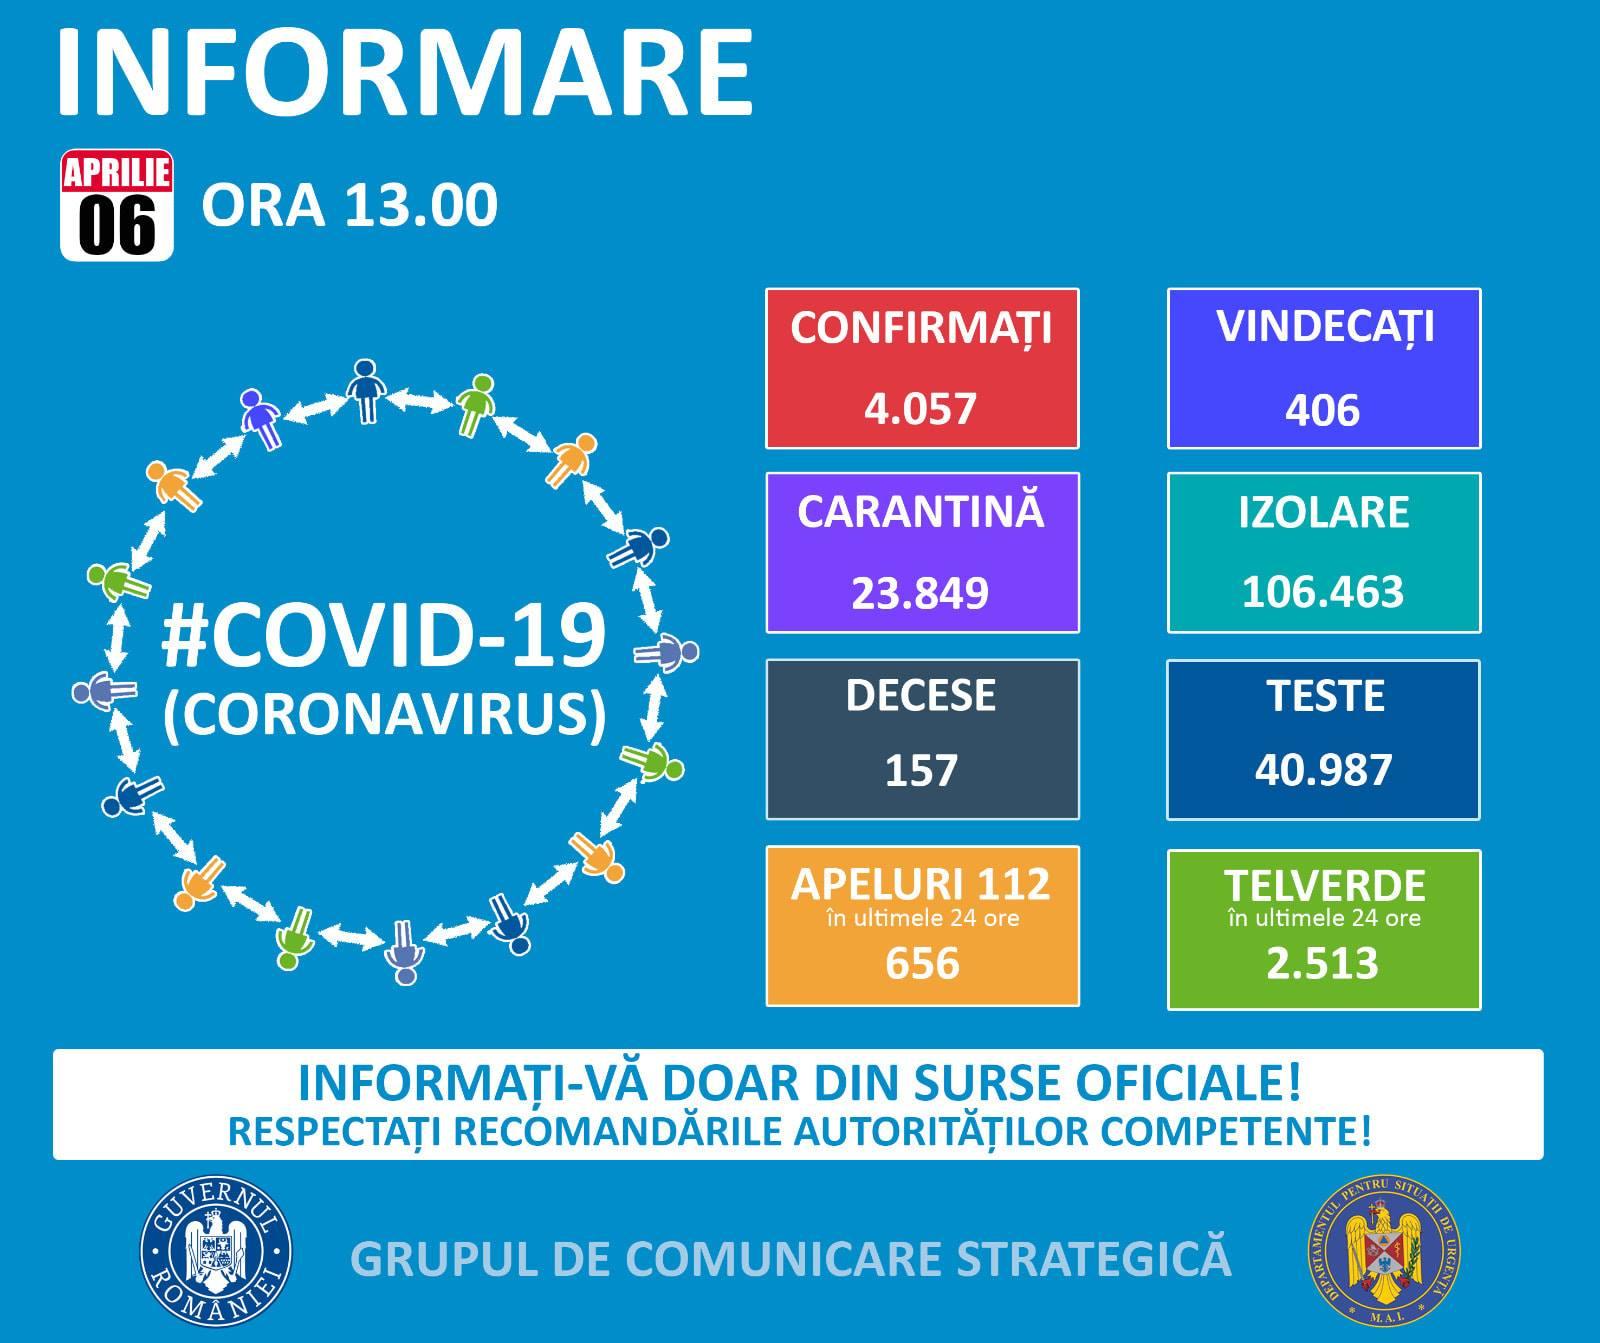 Coronavirus Romania situatie 6 aprilie 2020